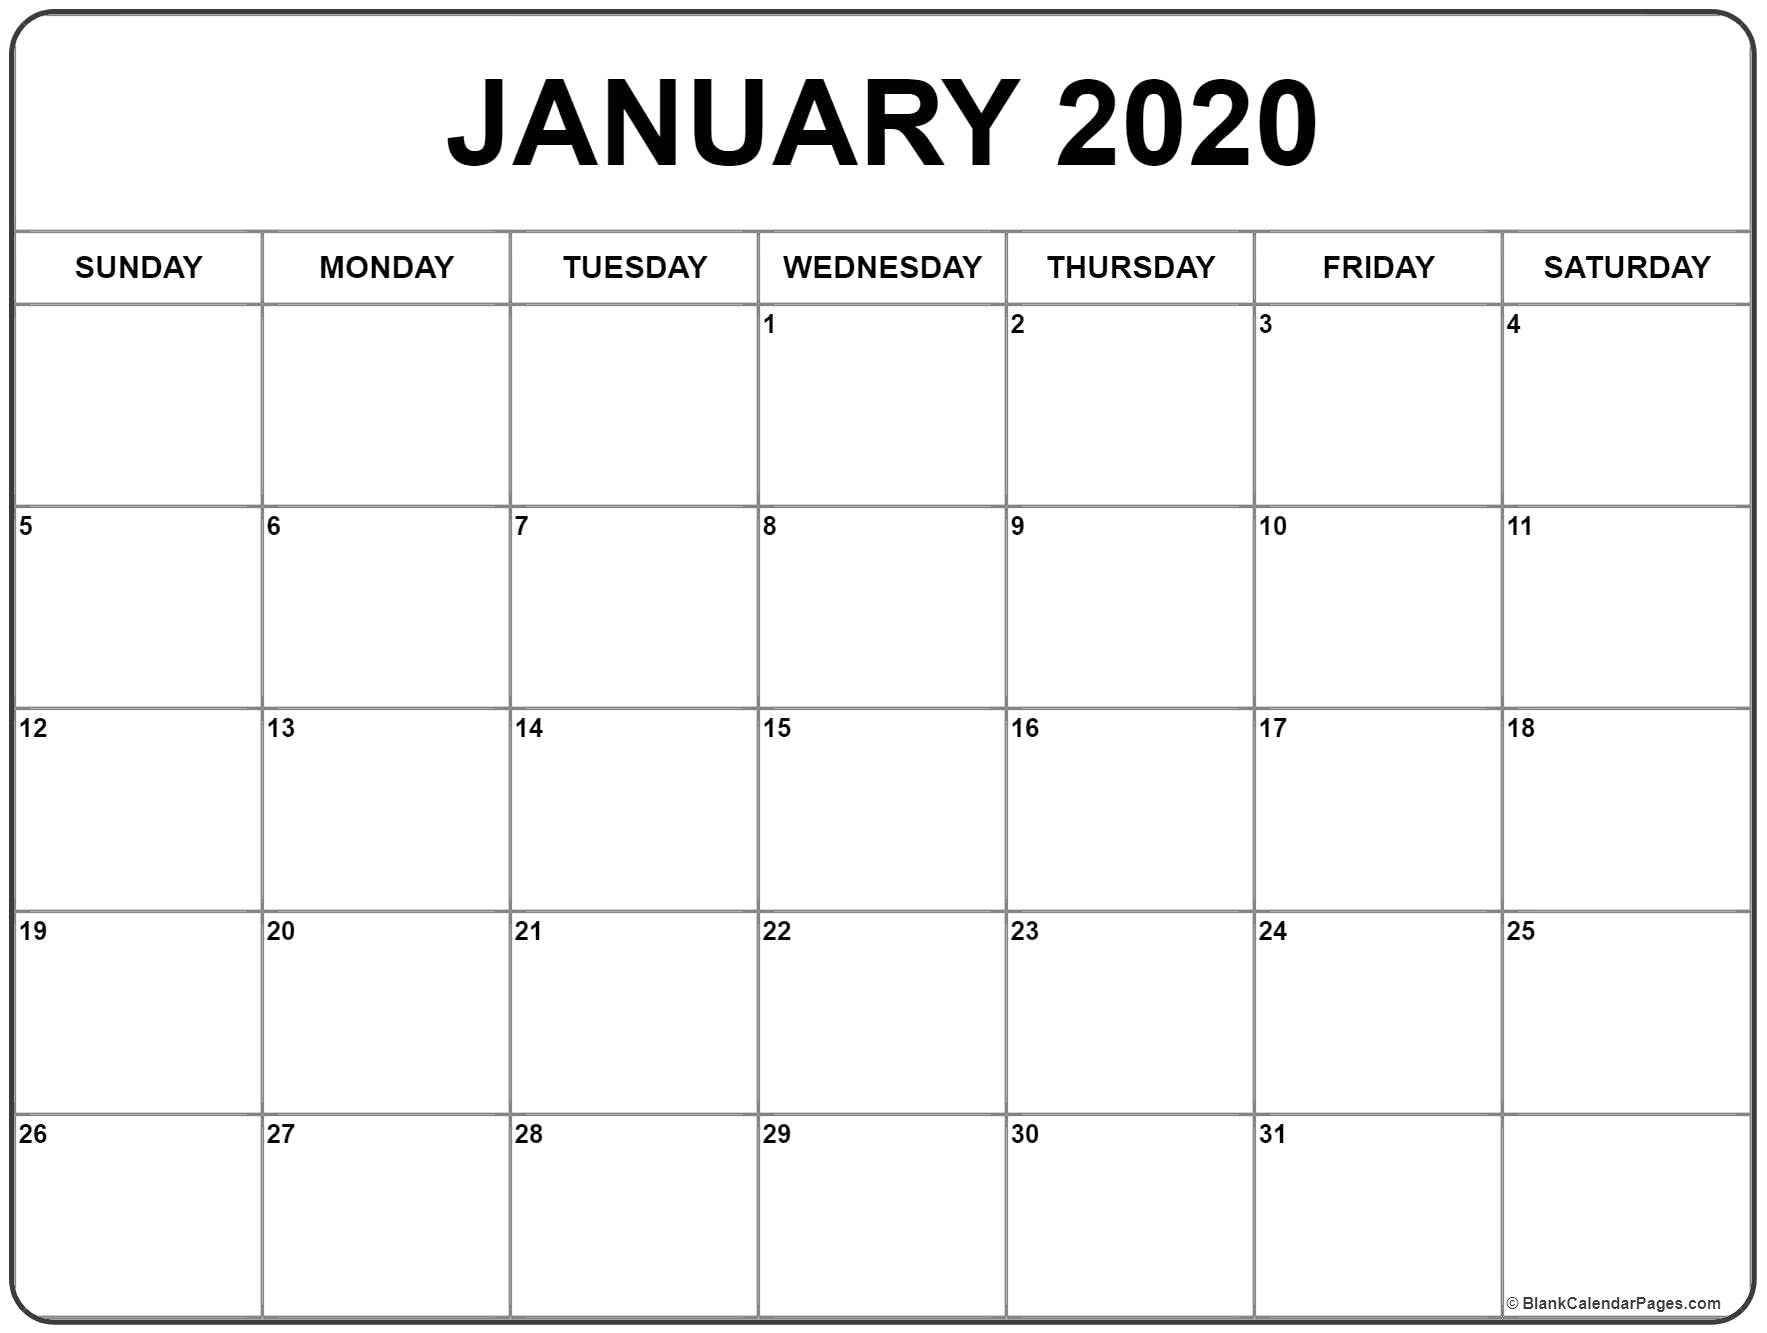 January 2020 Calendar B2 | Jcreview-Lunar Calendar January 2020